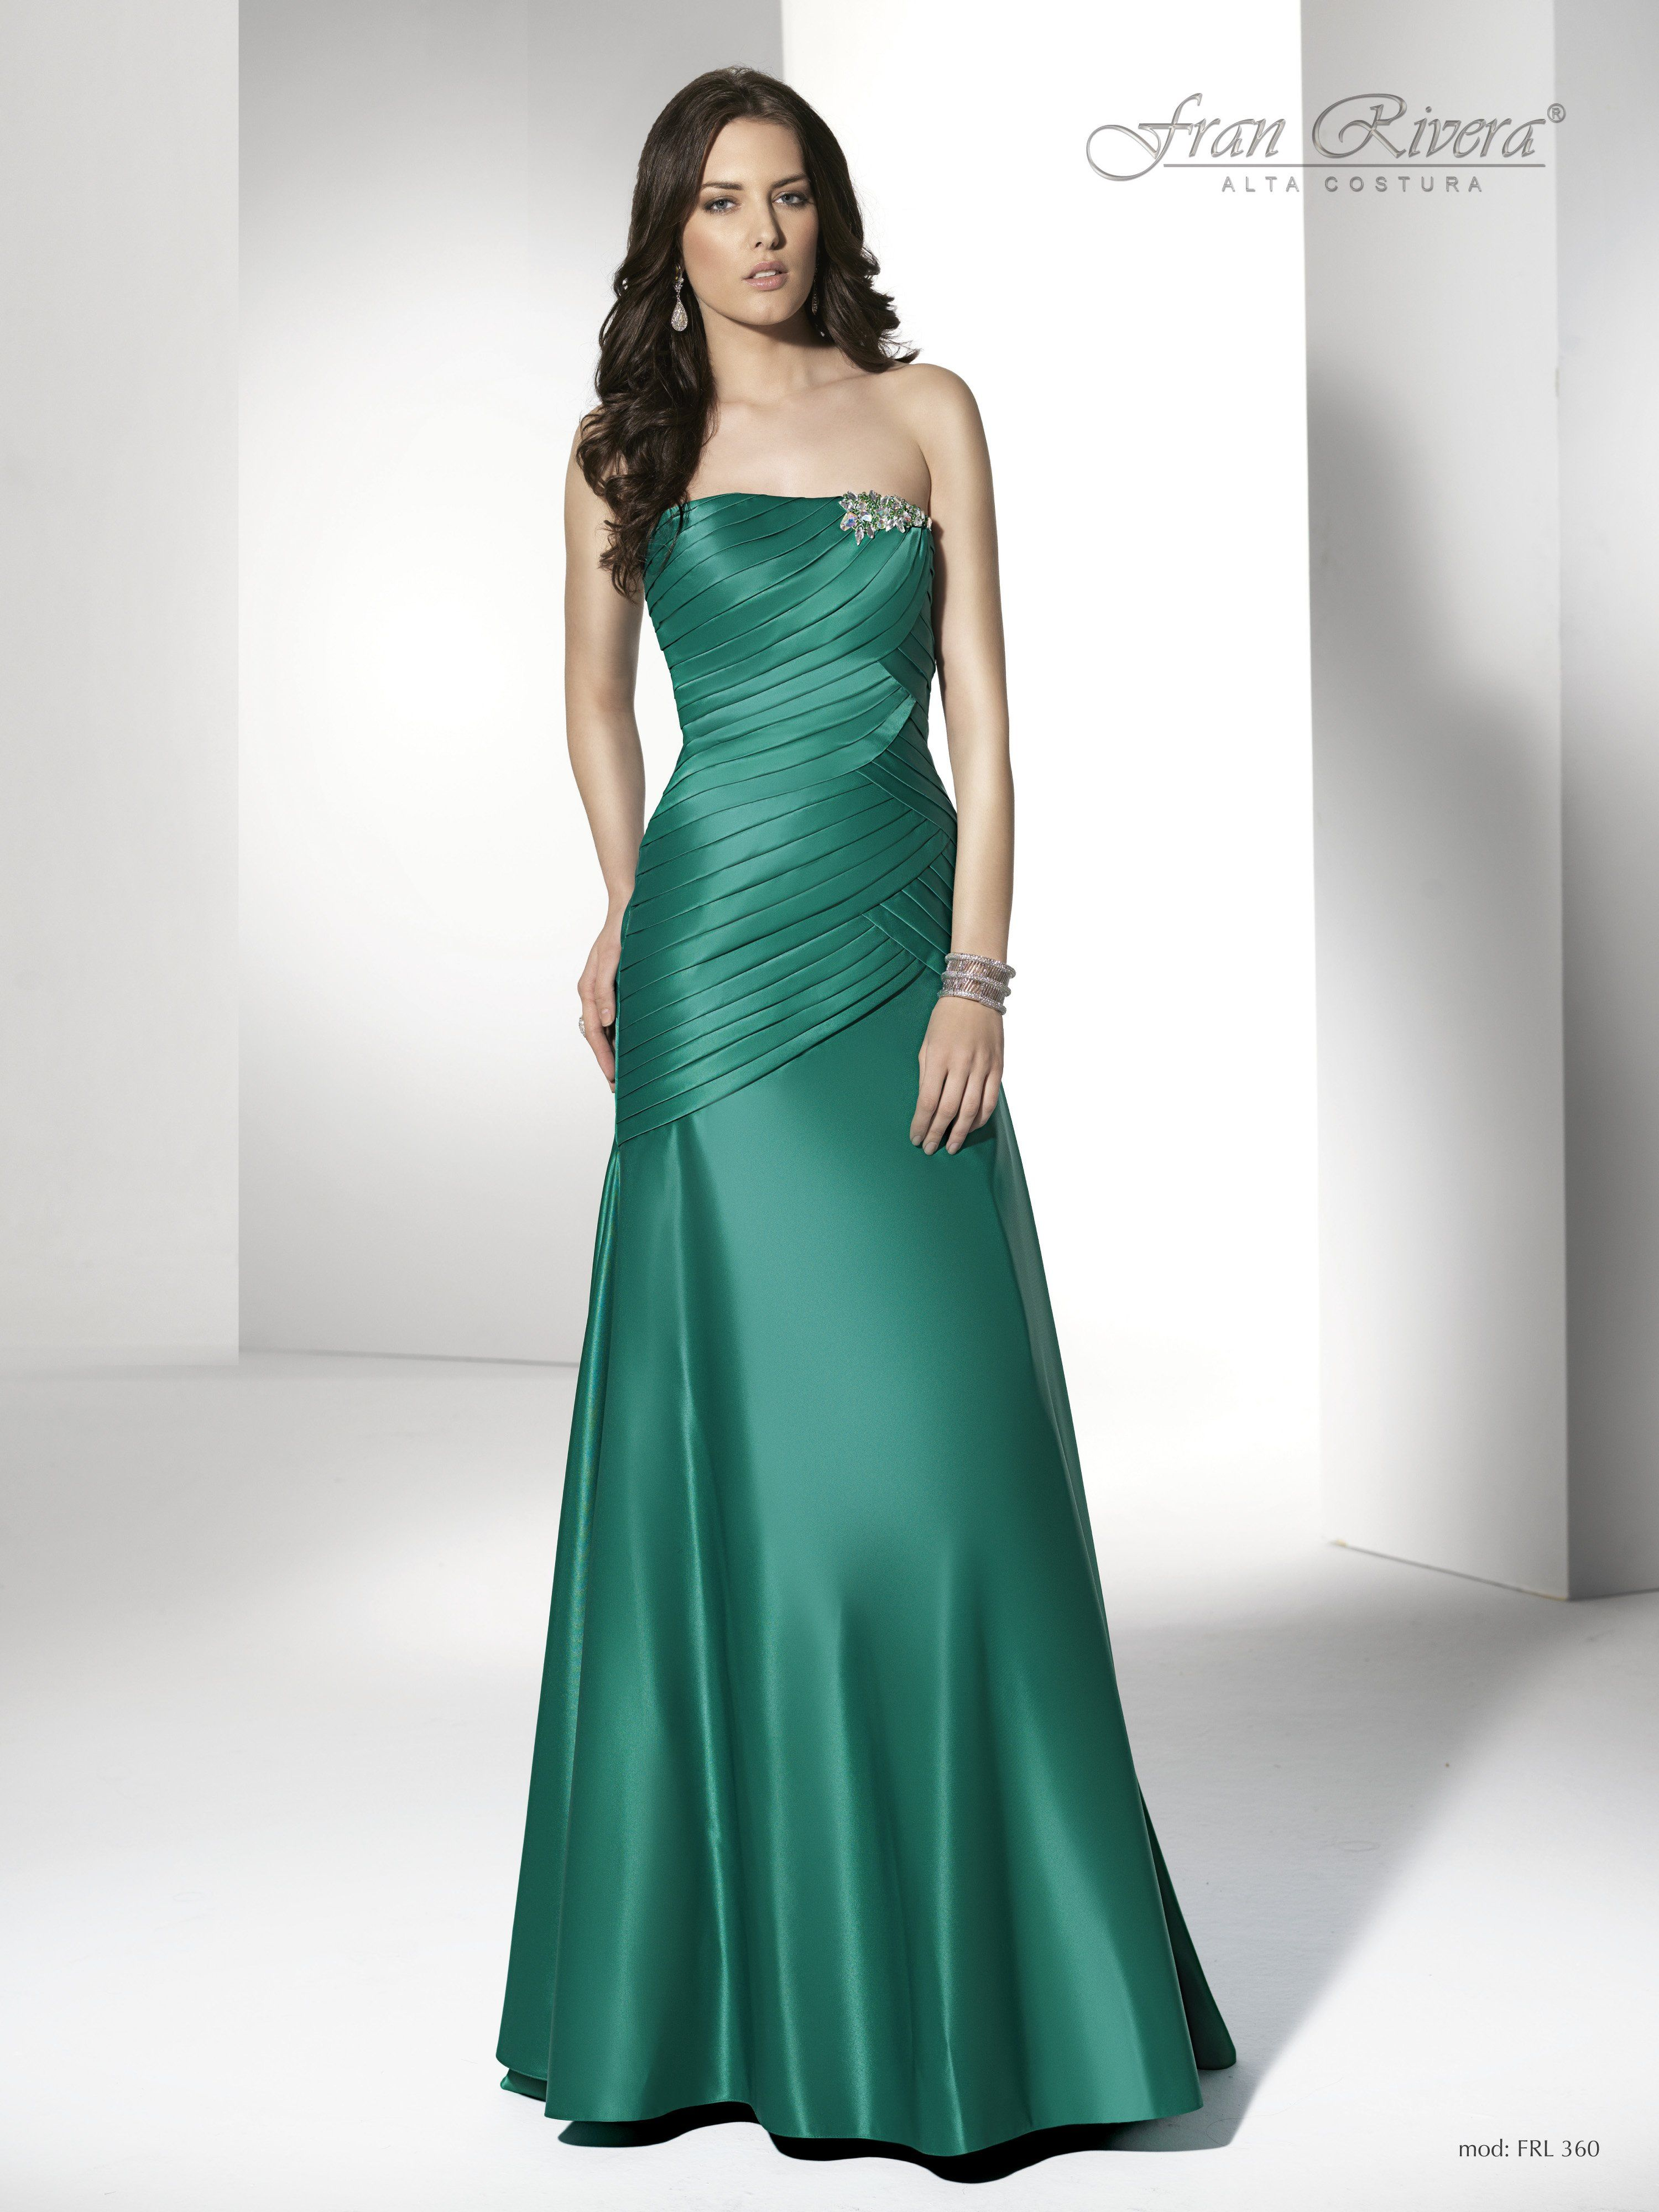 Modas de vestidos de noche largos